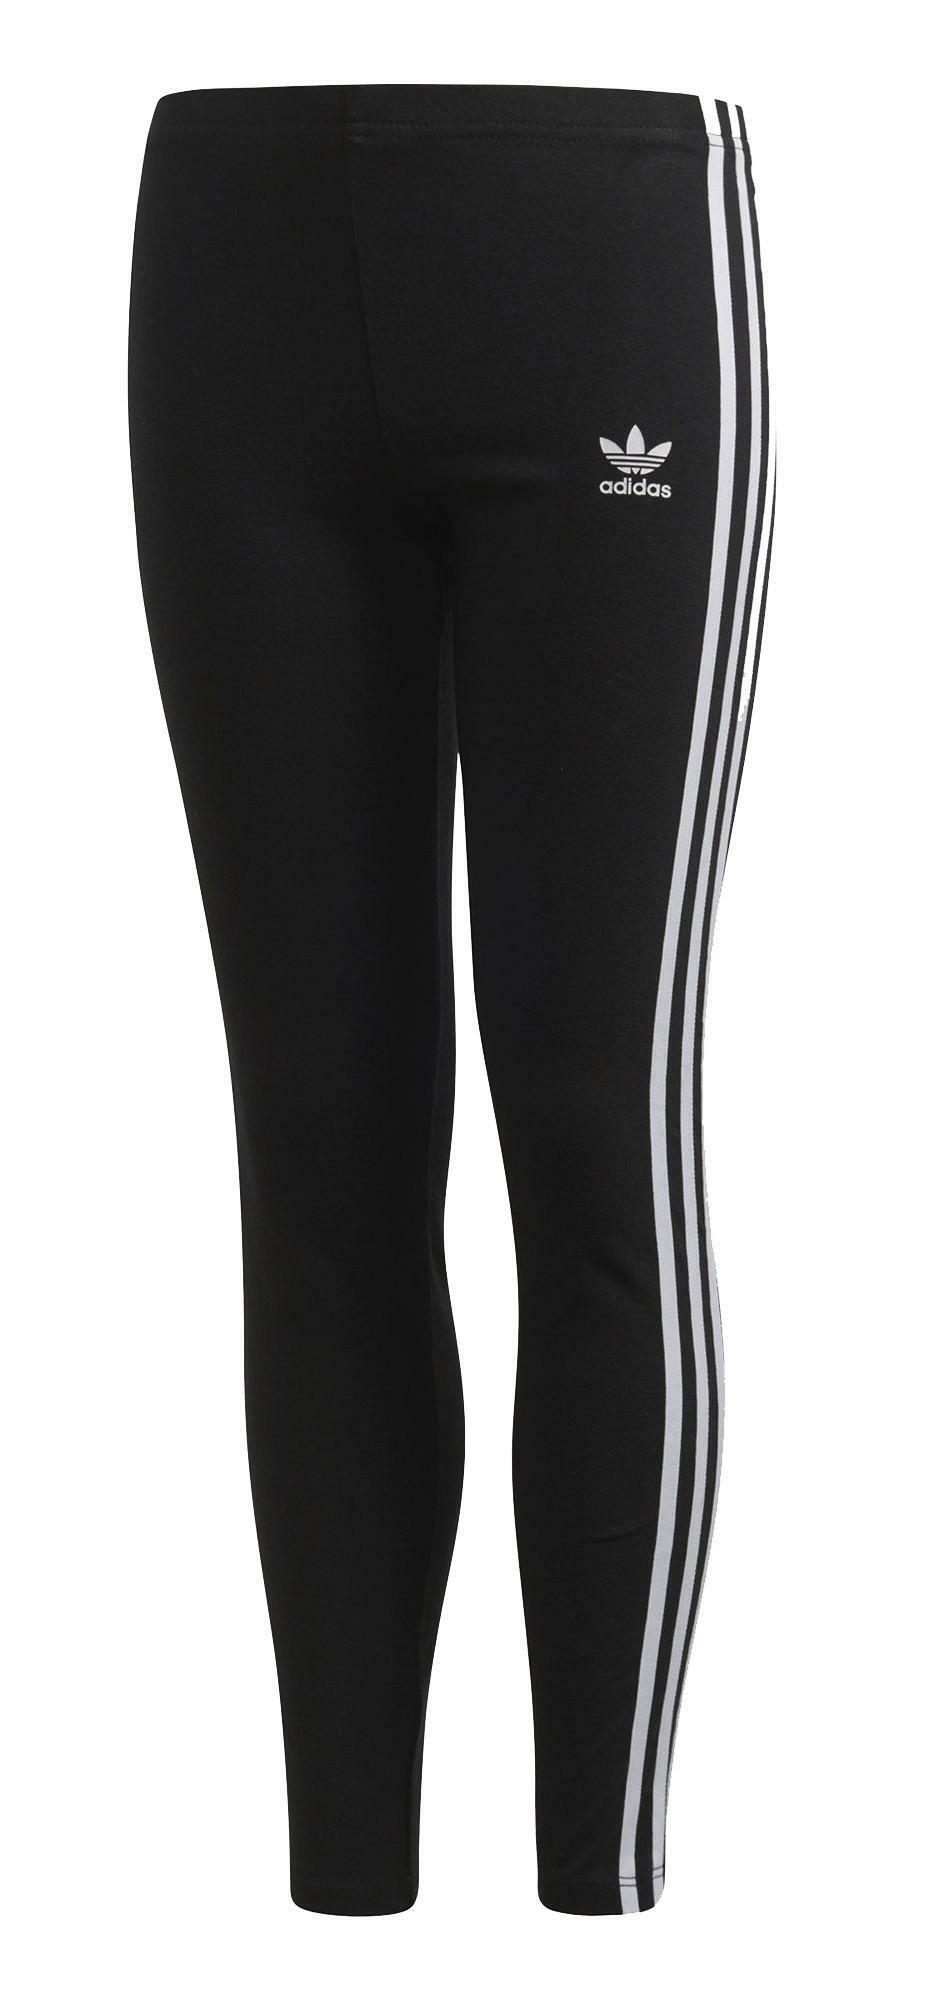 adidas adidas 3 stripes leggings neri bambina cd8411